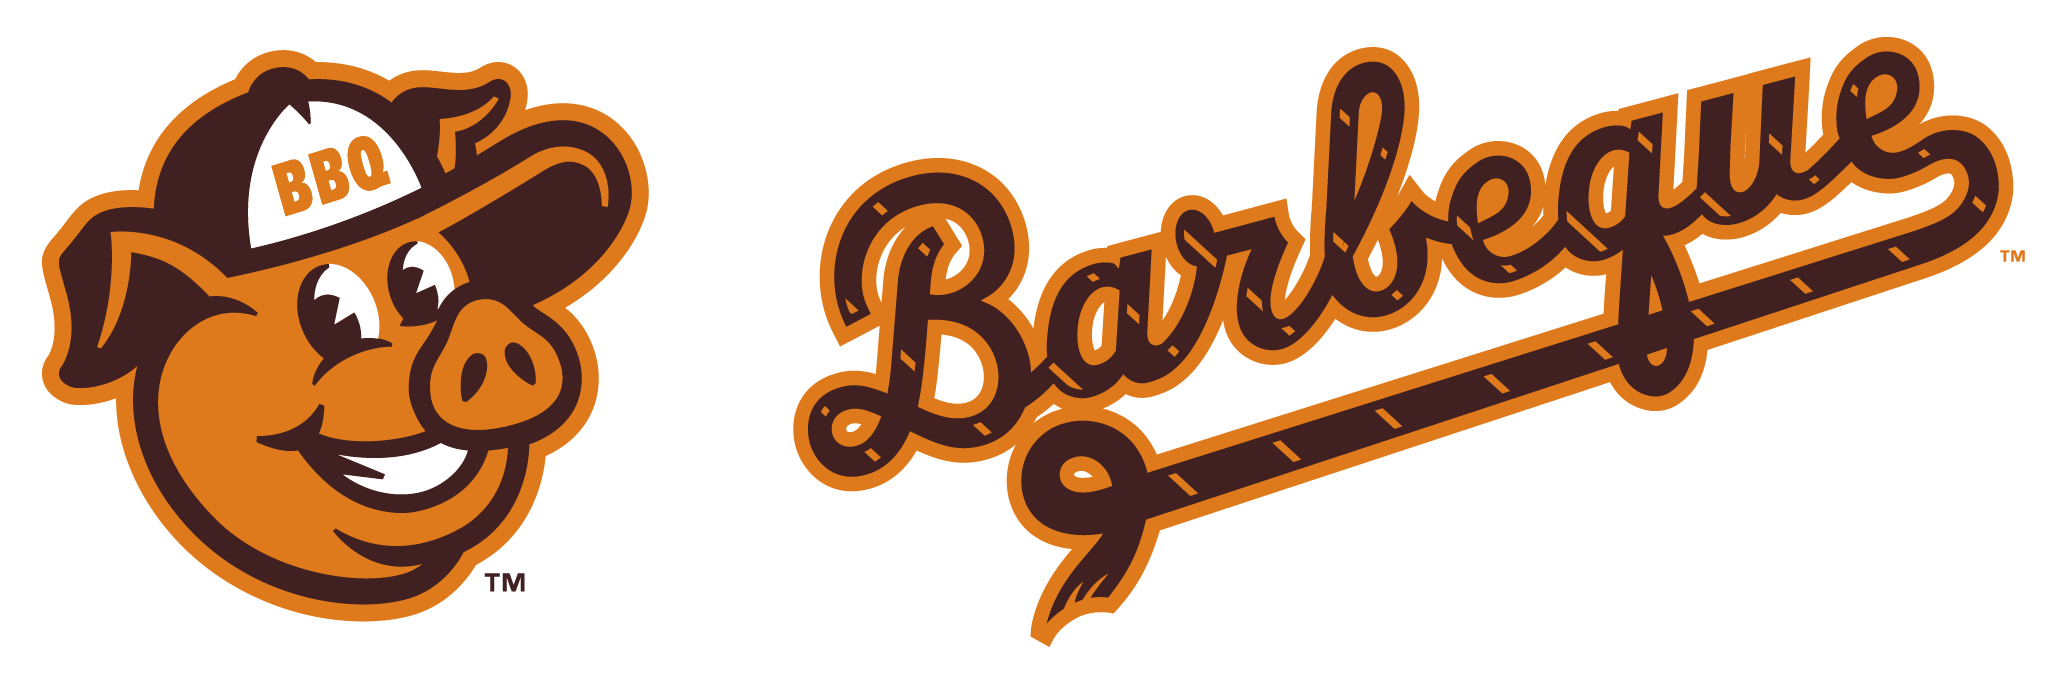 Lehigh-3-BallparkMagic_Barbeque.png